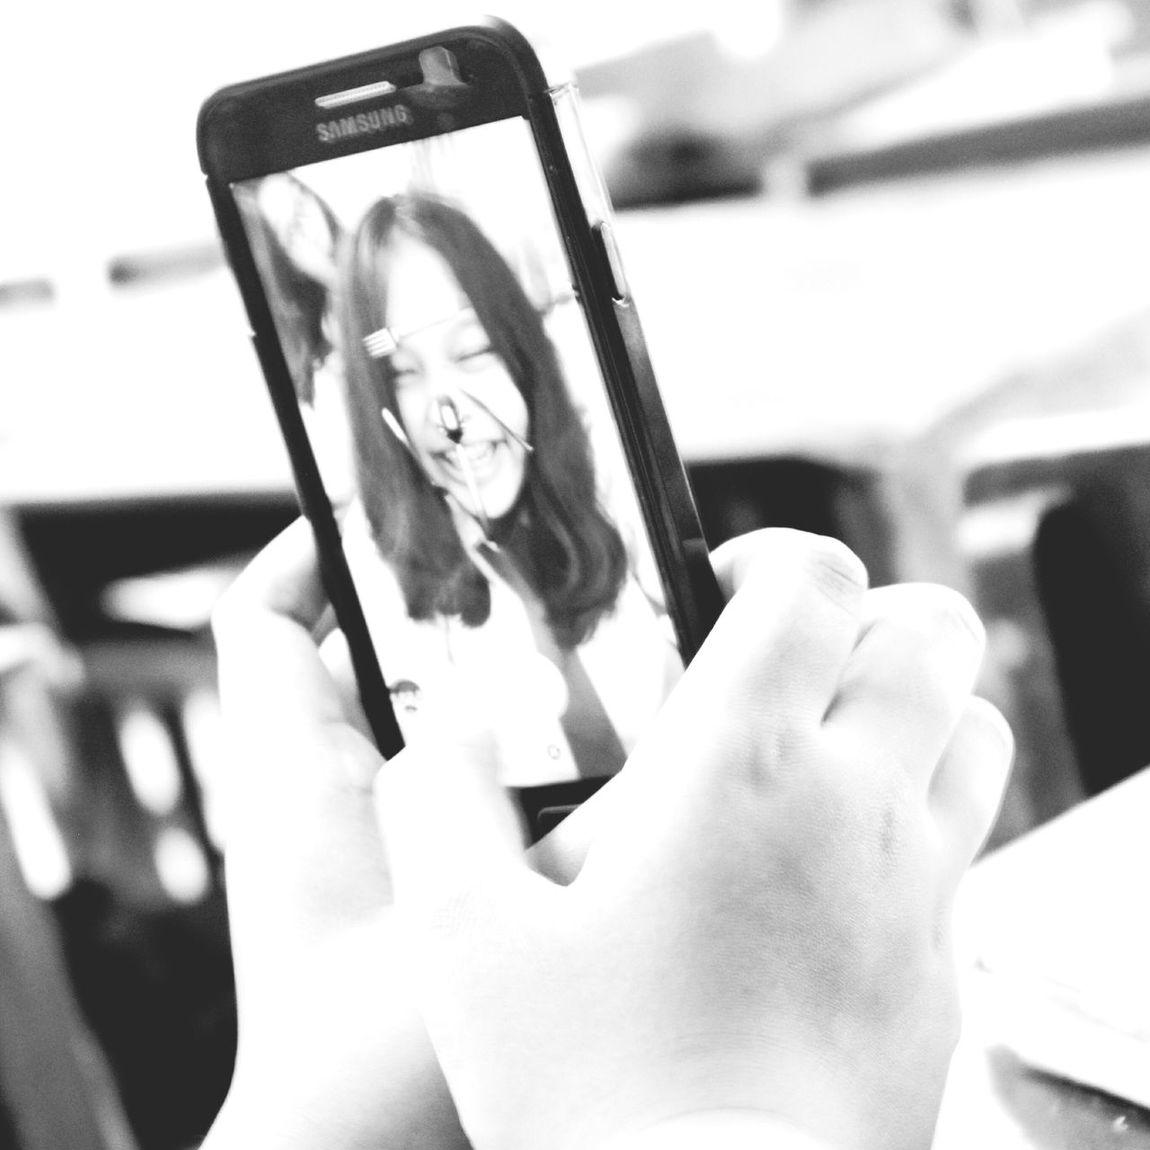 Snapchat's make me happy♥👧 Hanging Out Check This Out That's Me Hello World Cheese! Hi! Taking Photos Enjoying Life Socialmediaaddict Snapchatfilter Snapchataddict